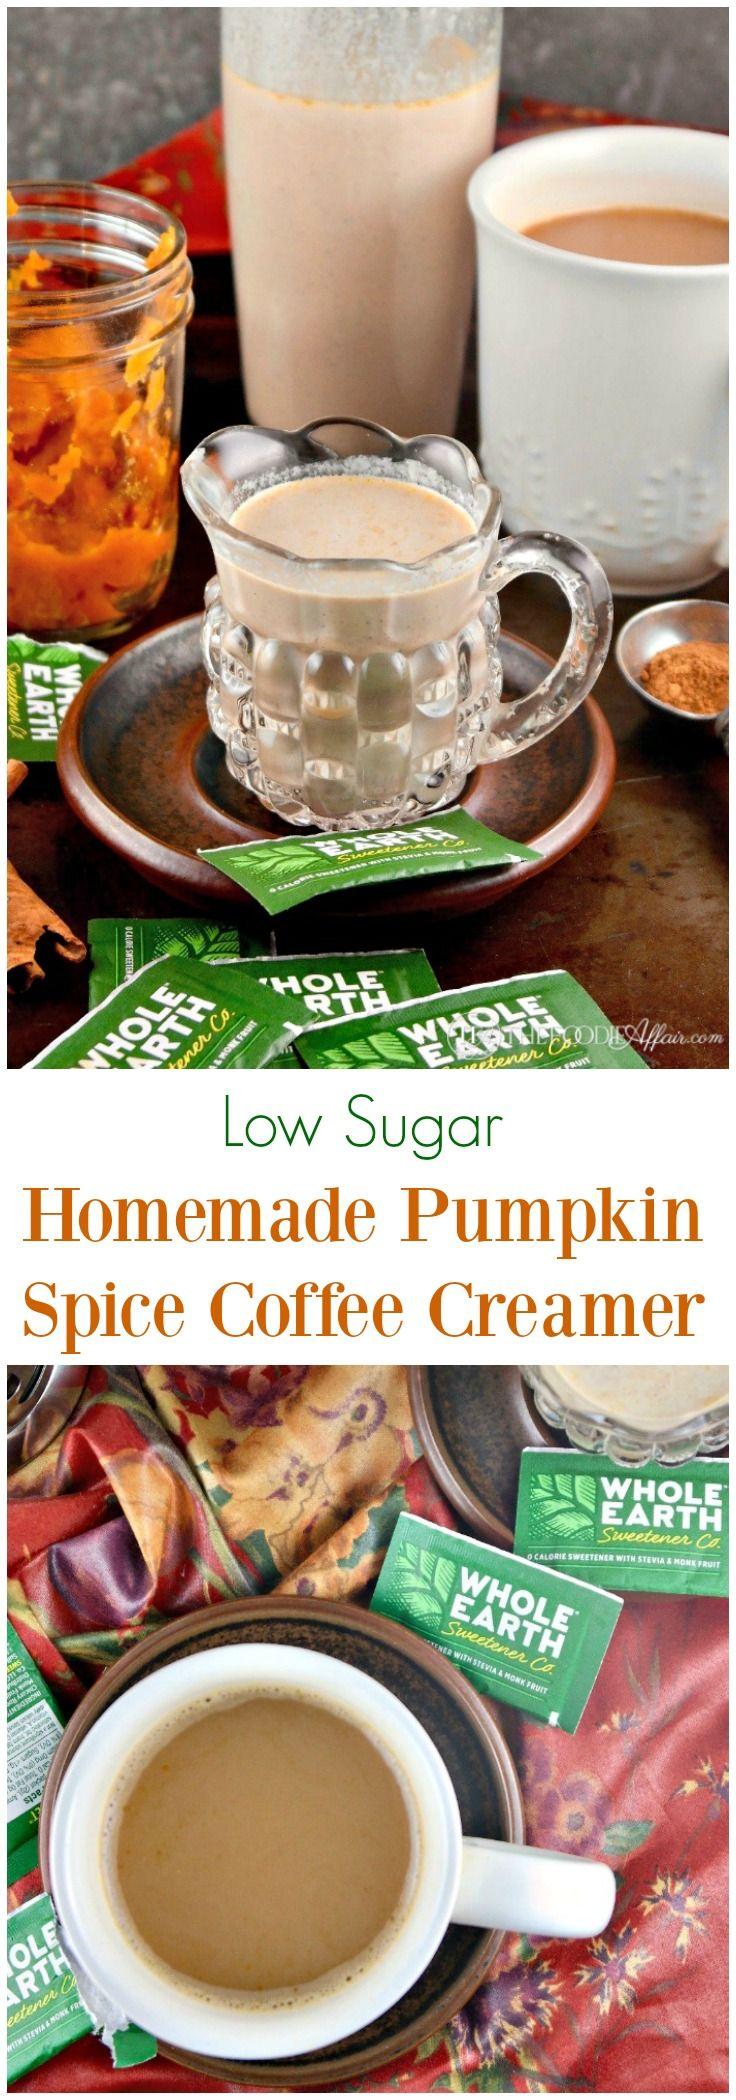 Lower Sugar Homemade Pumpkin Spice Coffee Creamer Recipe